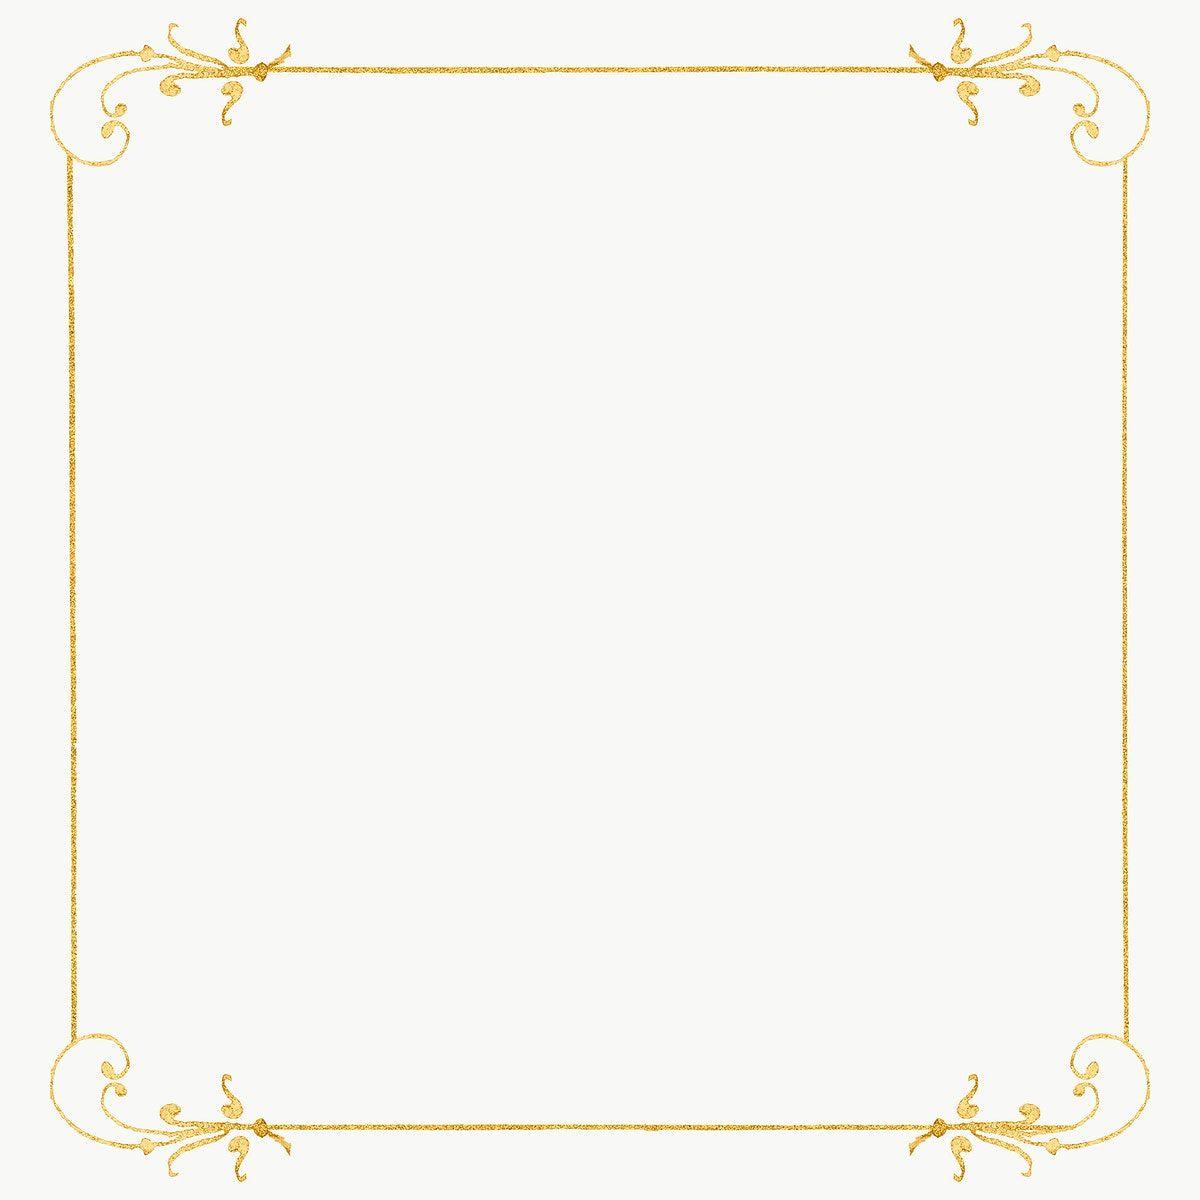 Gold Filigree Frame Border Png Free Image By Rawpixel Com Hwangmangjoo Antique Artwork Pinkish Gold Vintage Frames